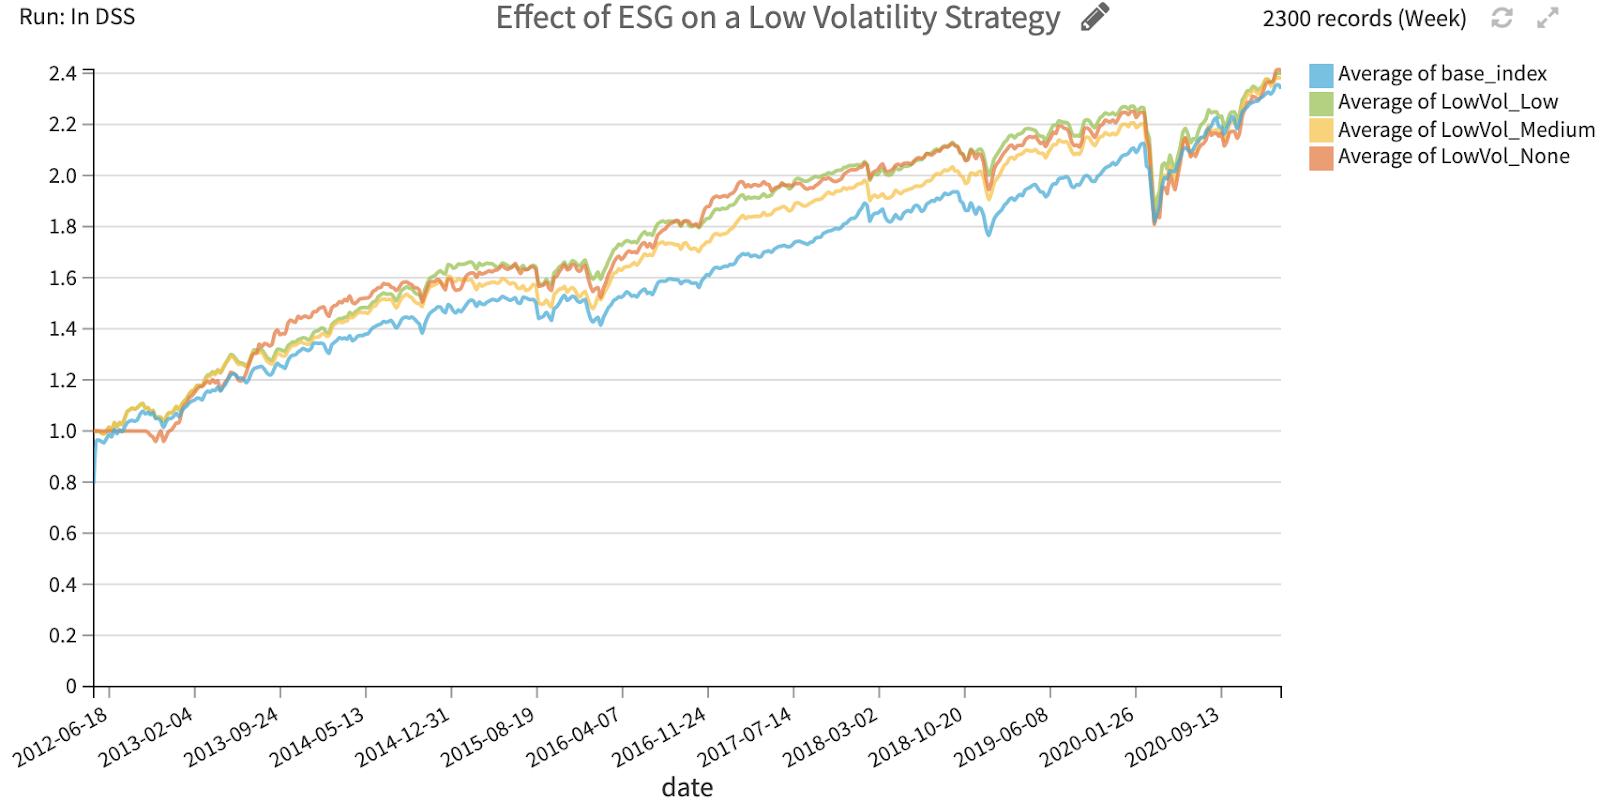 ESG effect on low volatility strategy